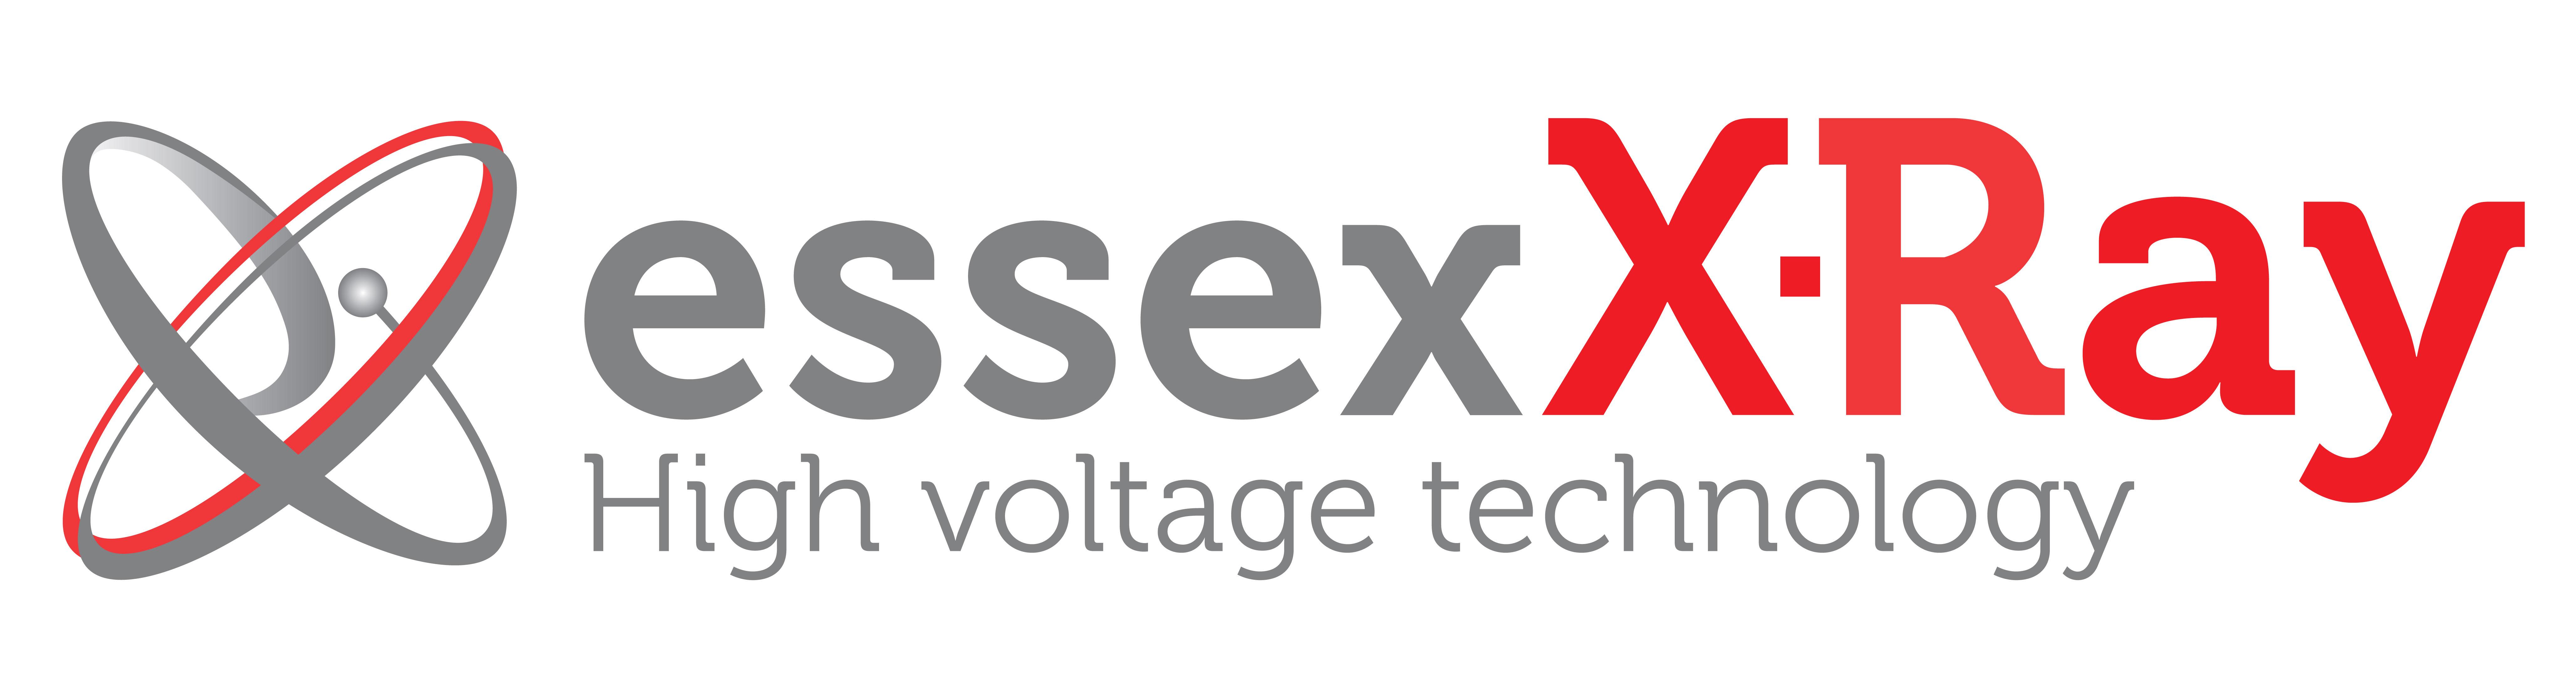 Essex X-Ray HVT High Voltage Technology